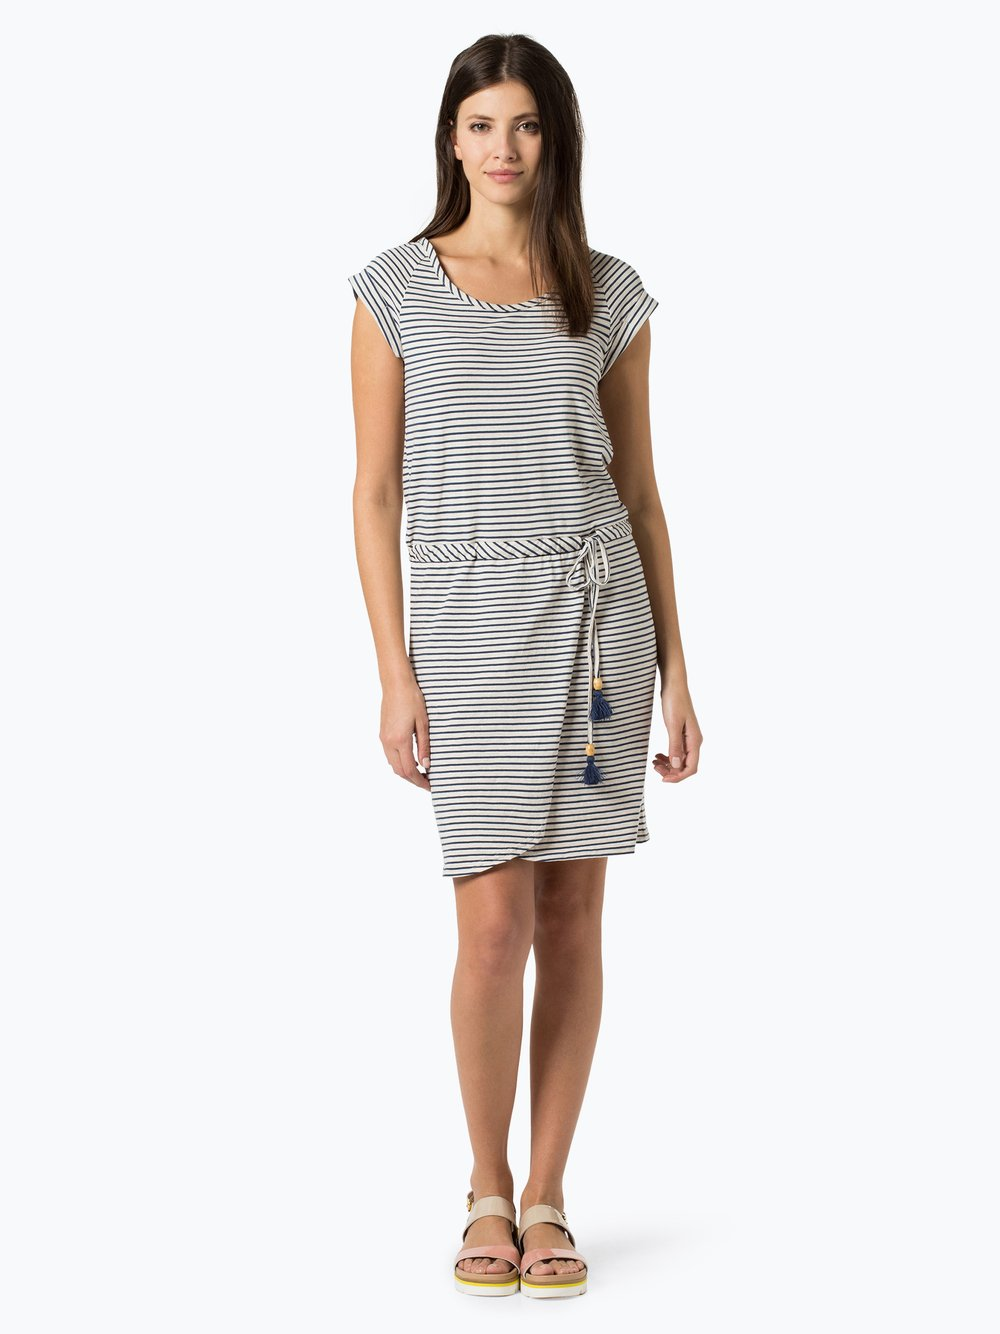 079c0e801d6a Ragwear Damen Kleid - Glitter Organic online kaufen | PEEK-UND ...